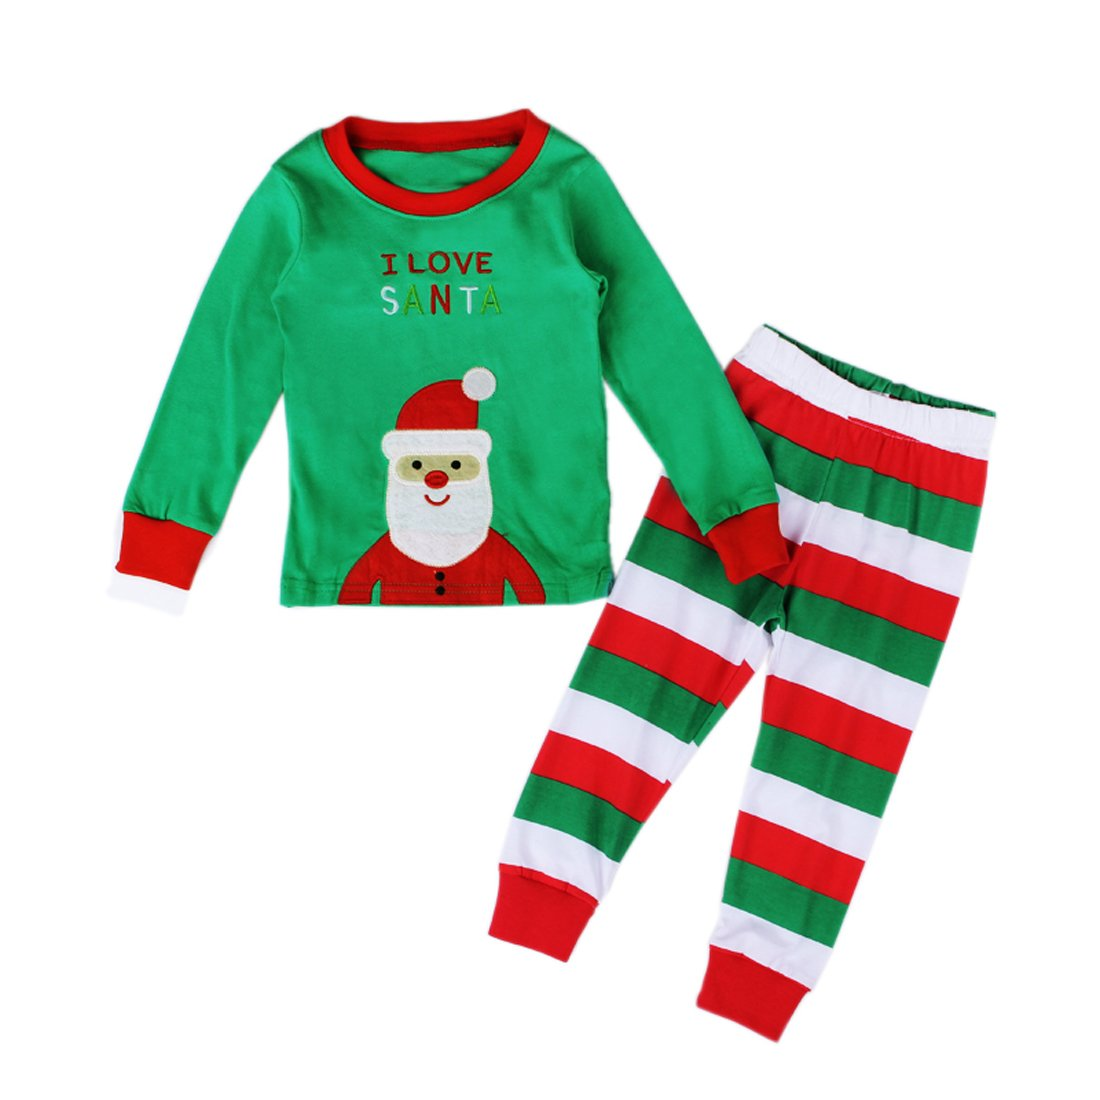 EITC Toddler Kid Boys Girls Cotton Christmas Santa Pajamas Shirt /& Pants Sets 2 Pcs